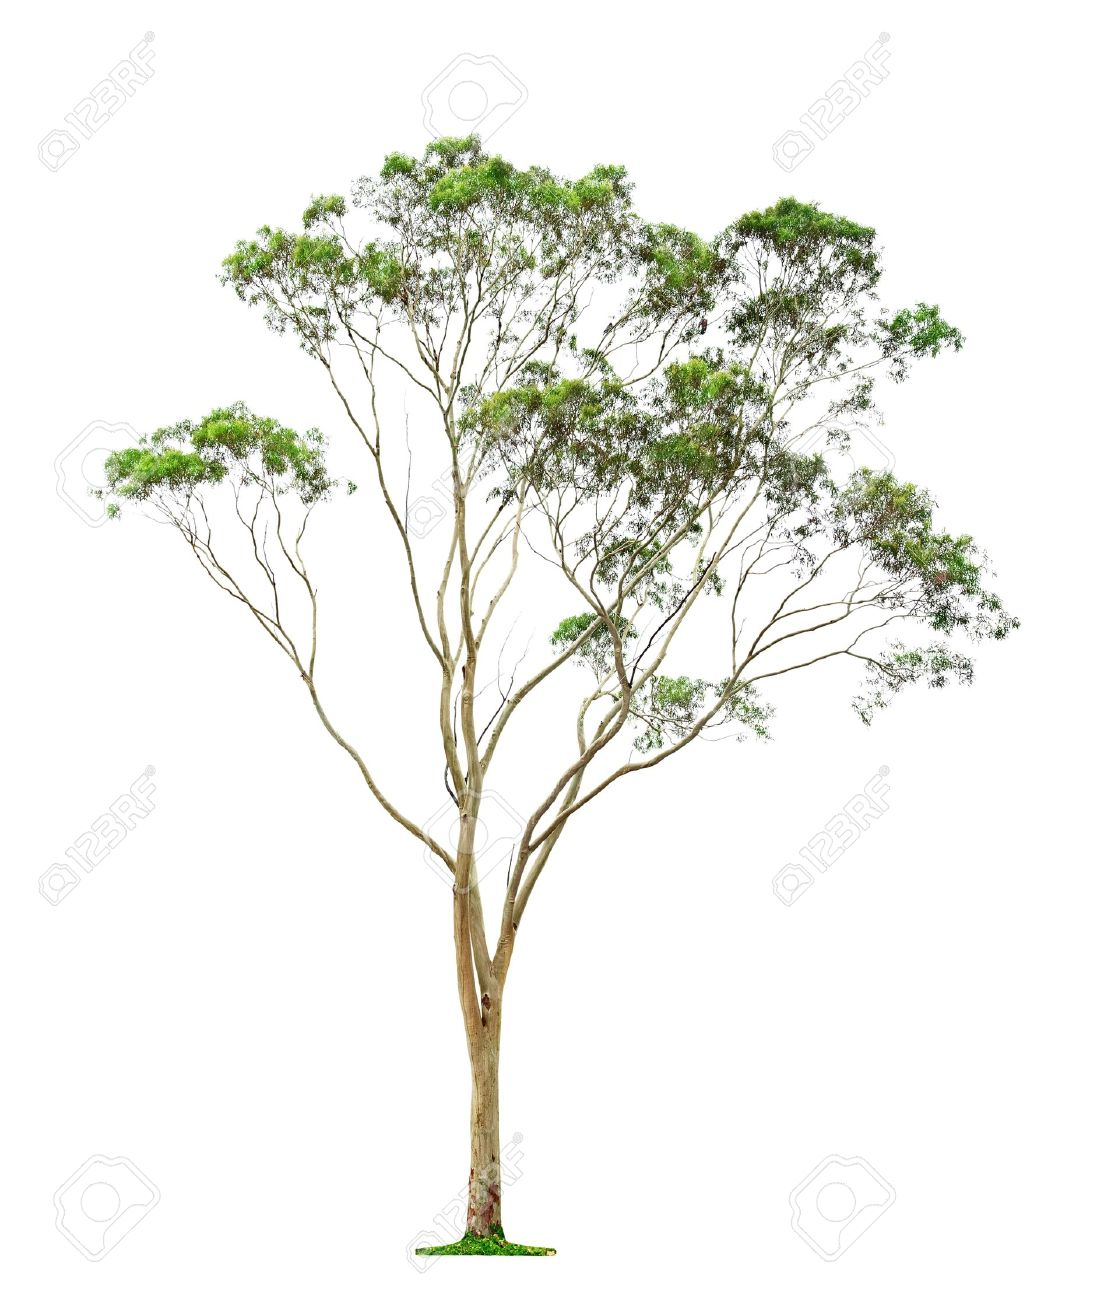 Eucalyptus Gum Tree clipart #18, Download drawings